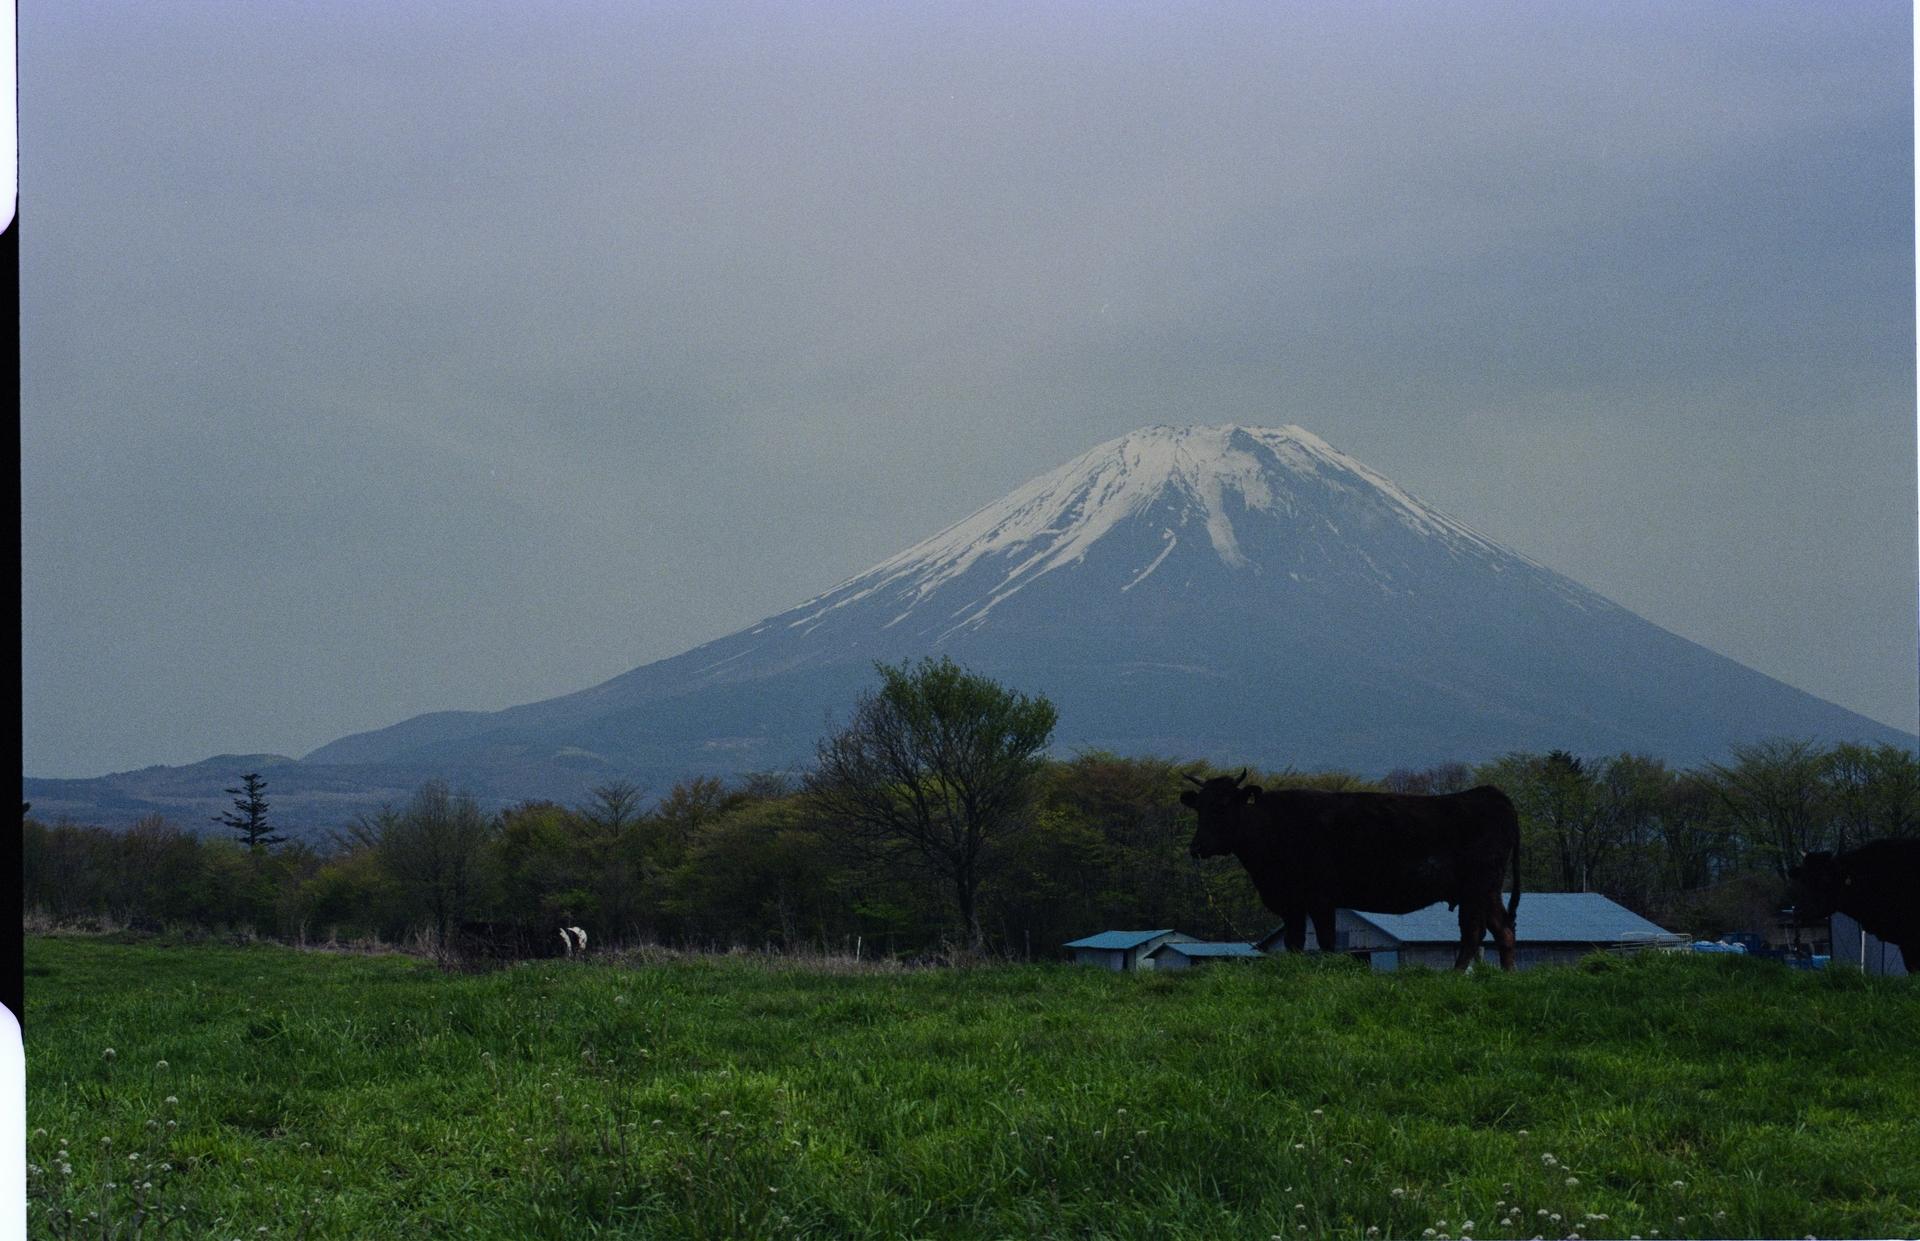 f:id:yasuo_ssi:20201015235423j:plain